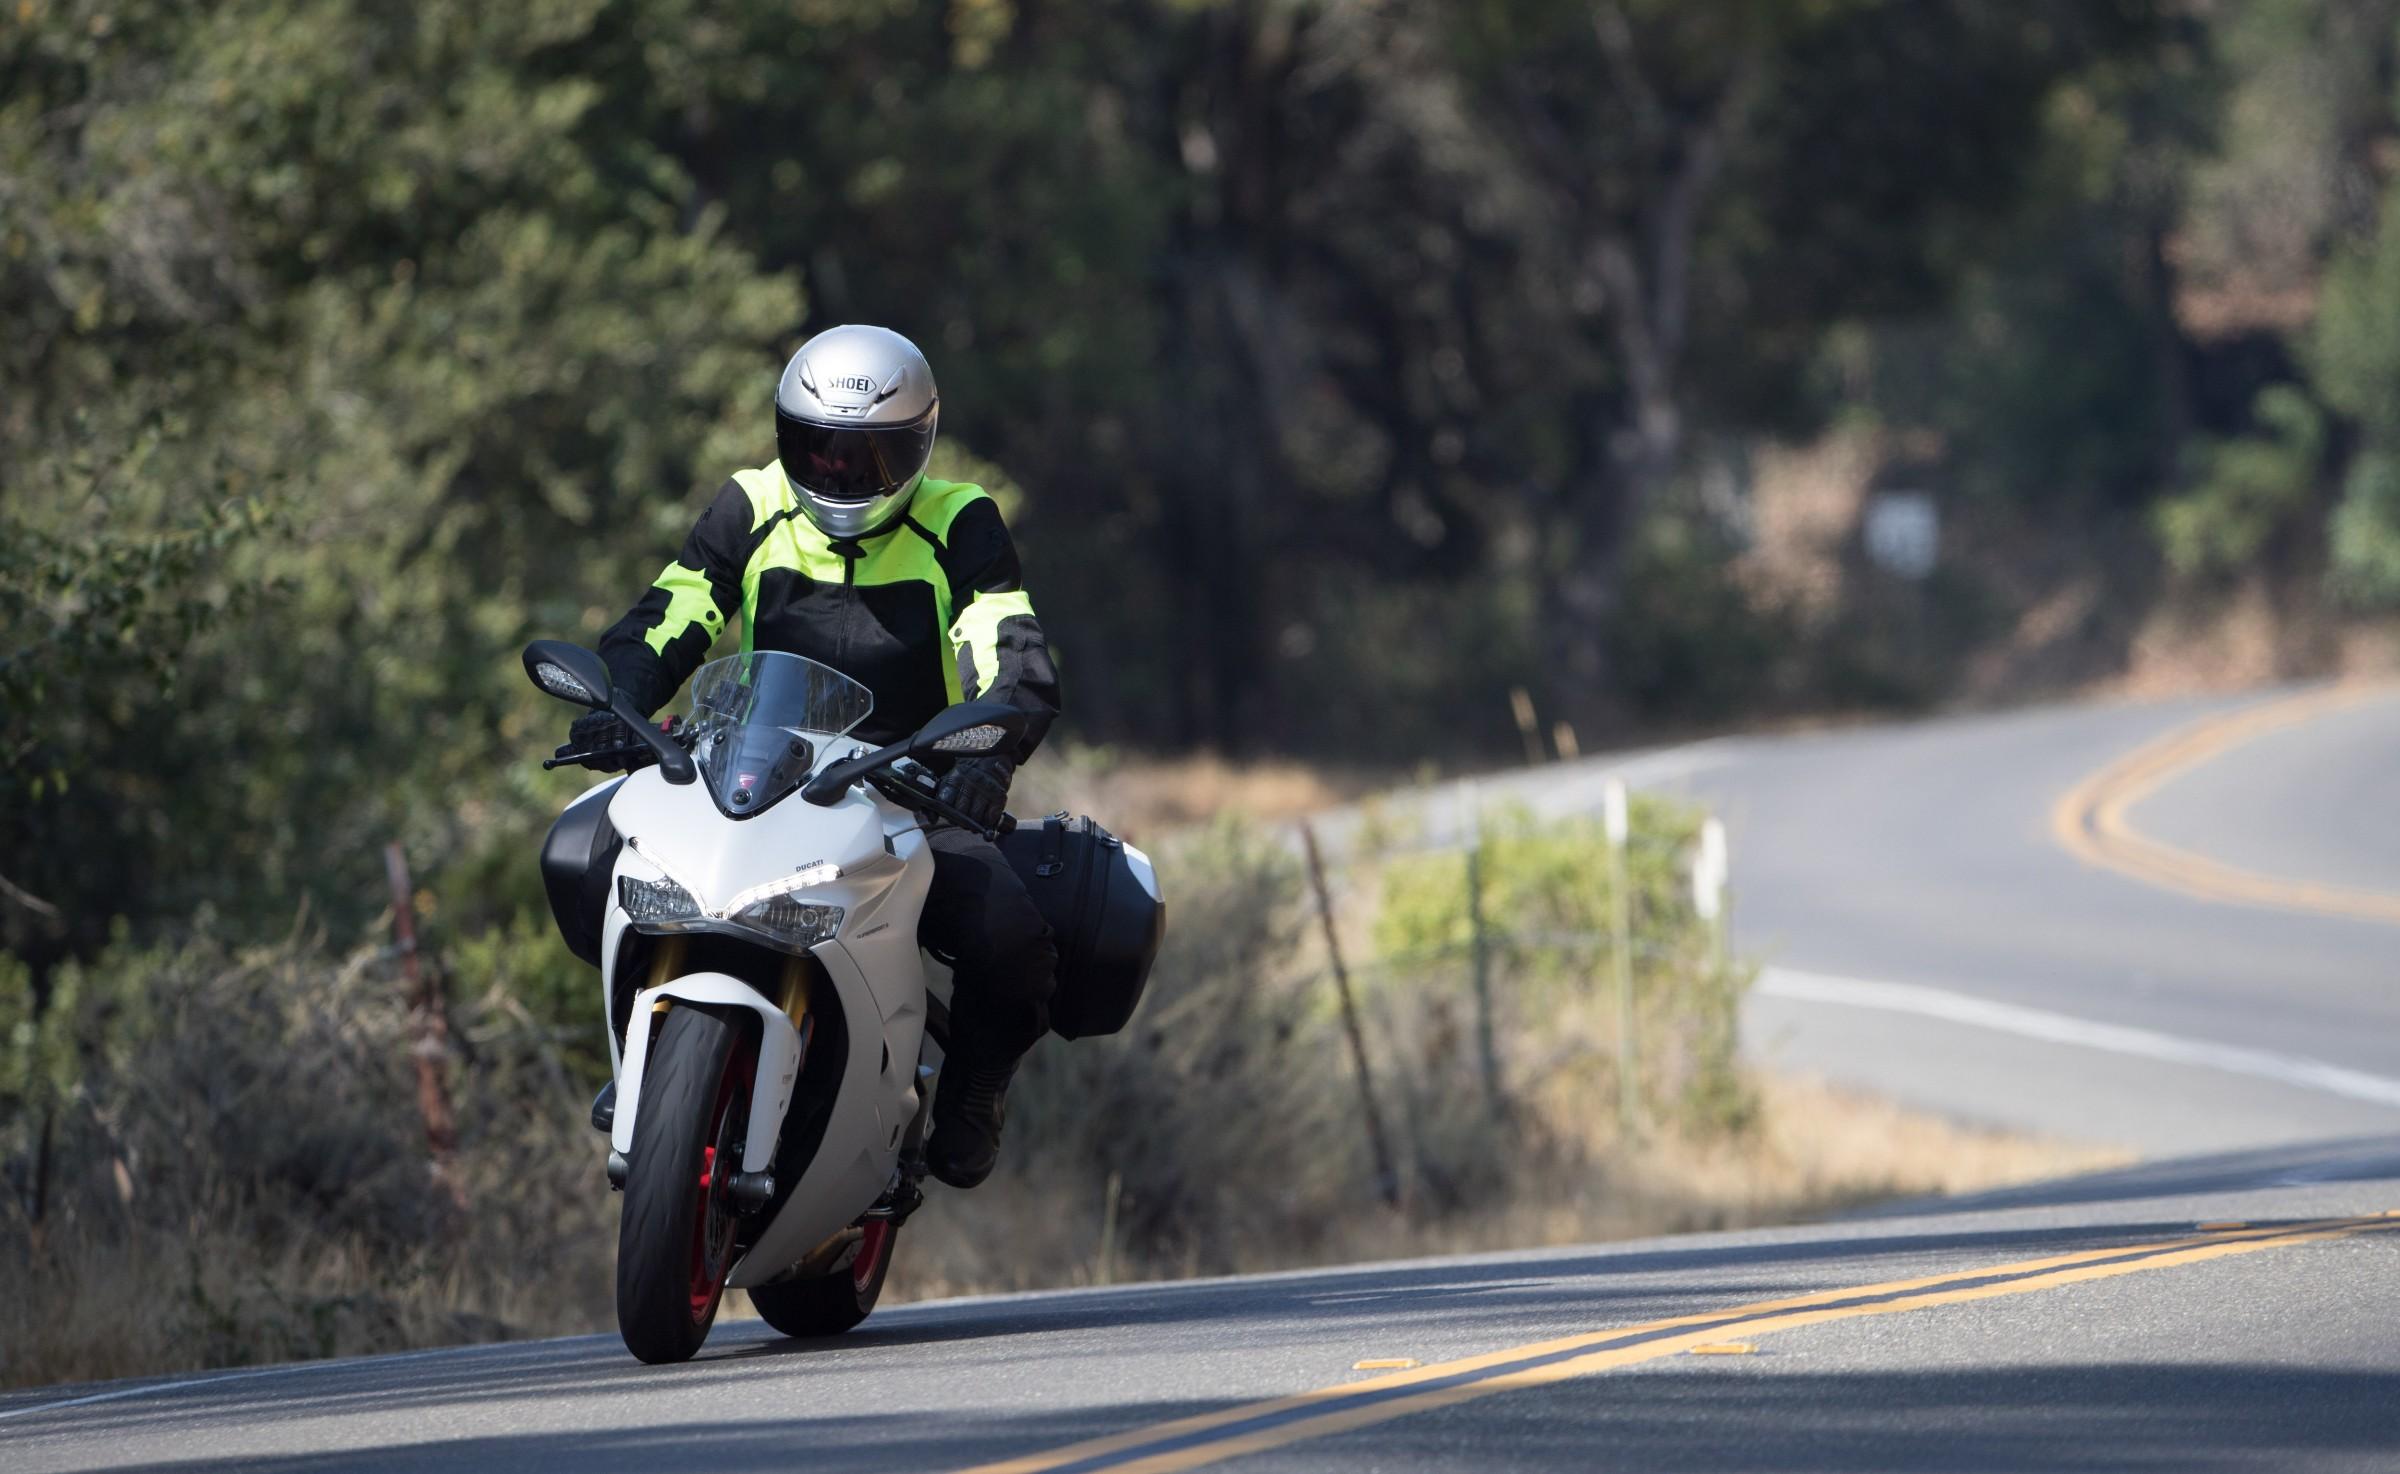 98955b2c793c 2018 Ducati SuperSport S review - RevZilla